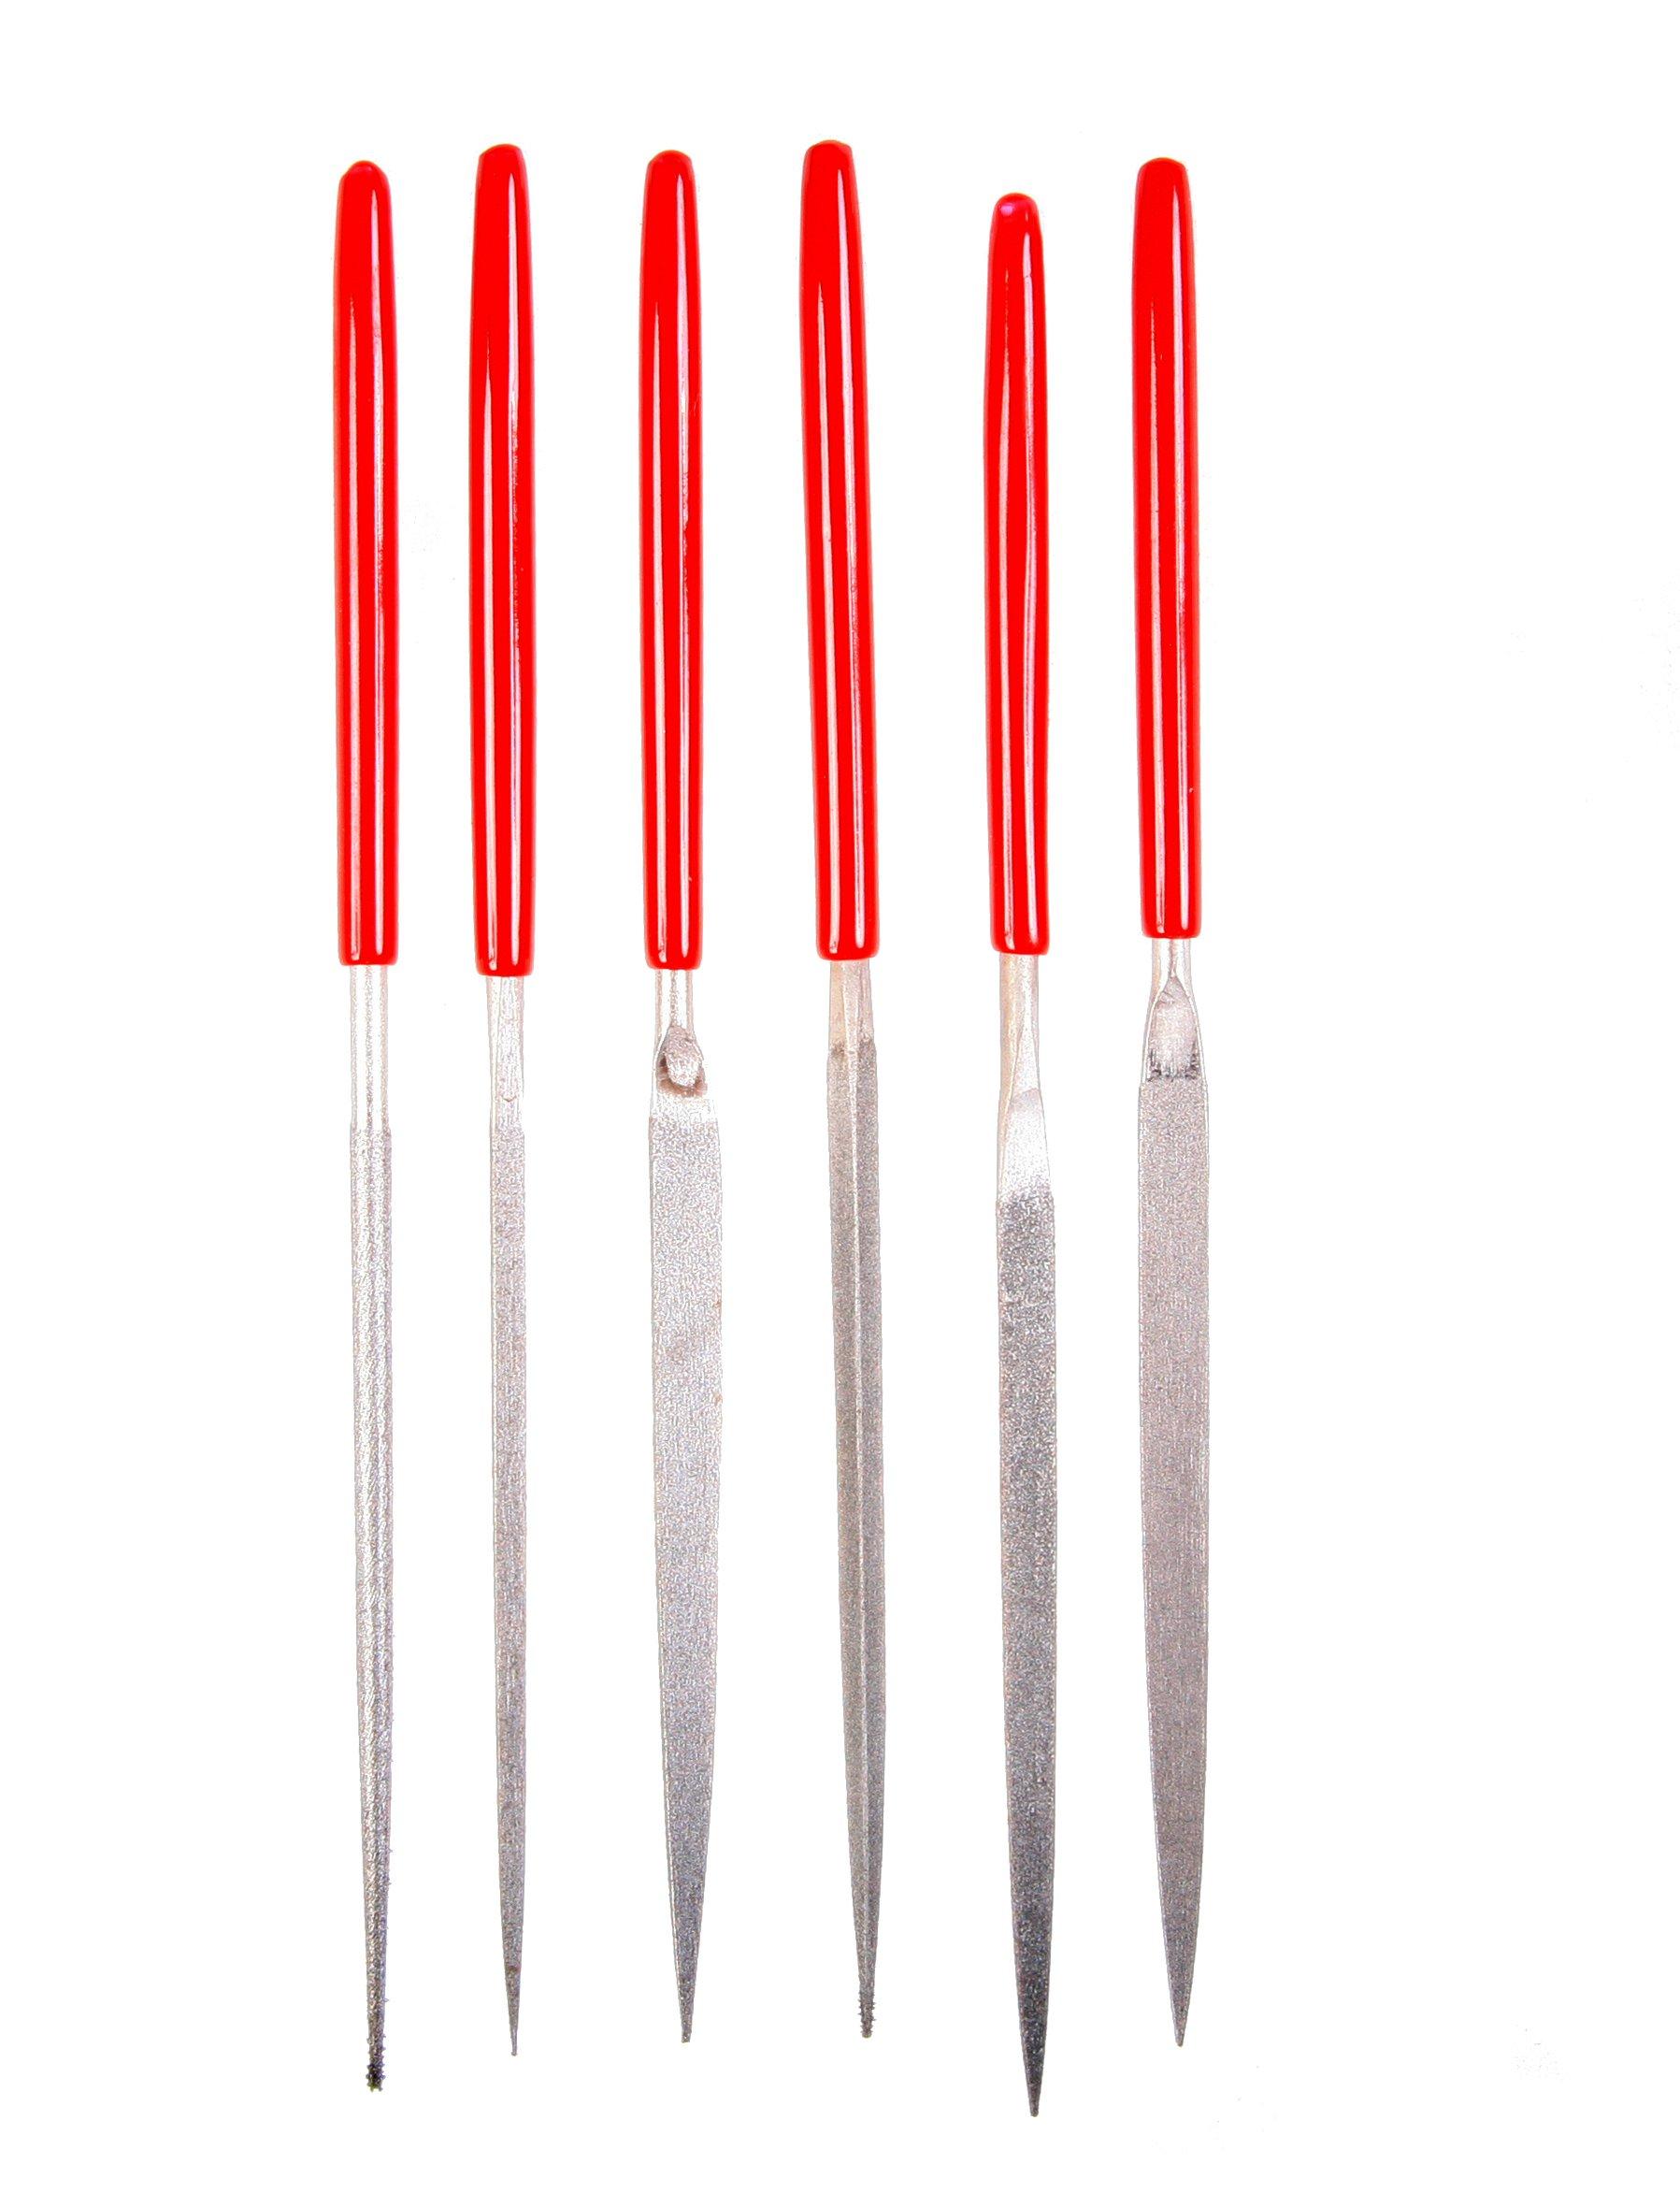 EZE-LAP 600F Fine Grit Diamond Needle File Set